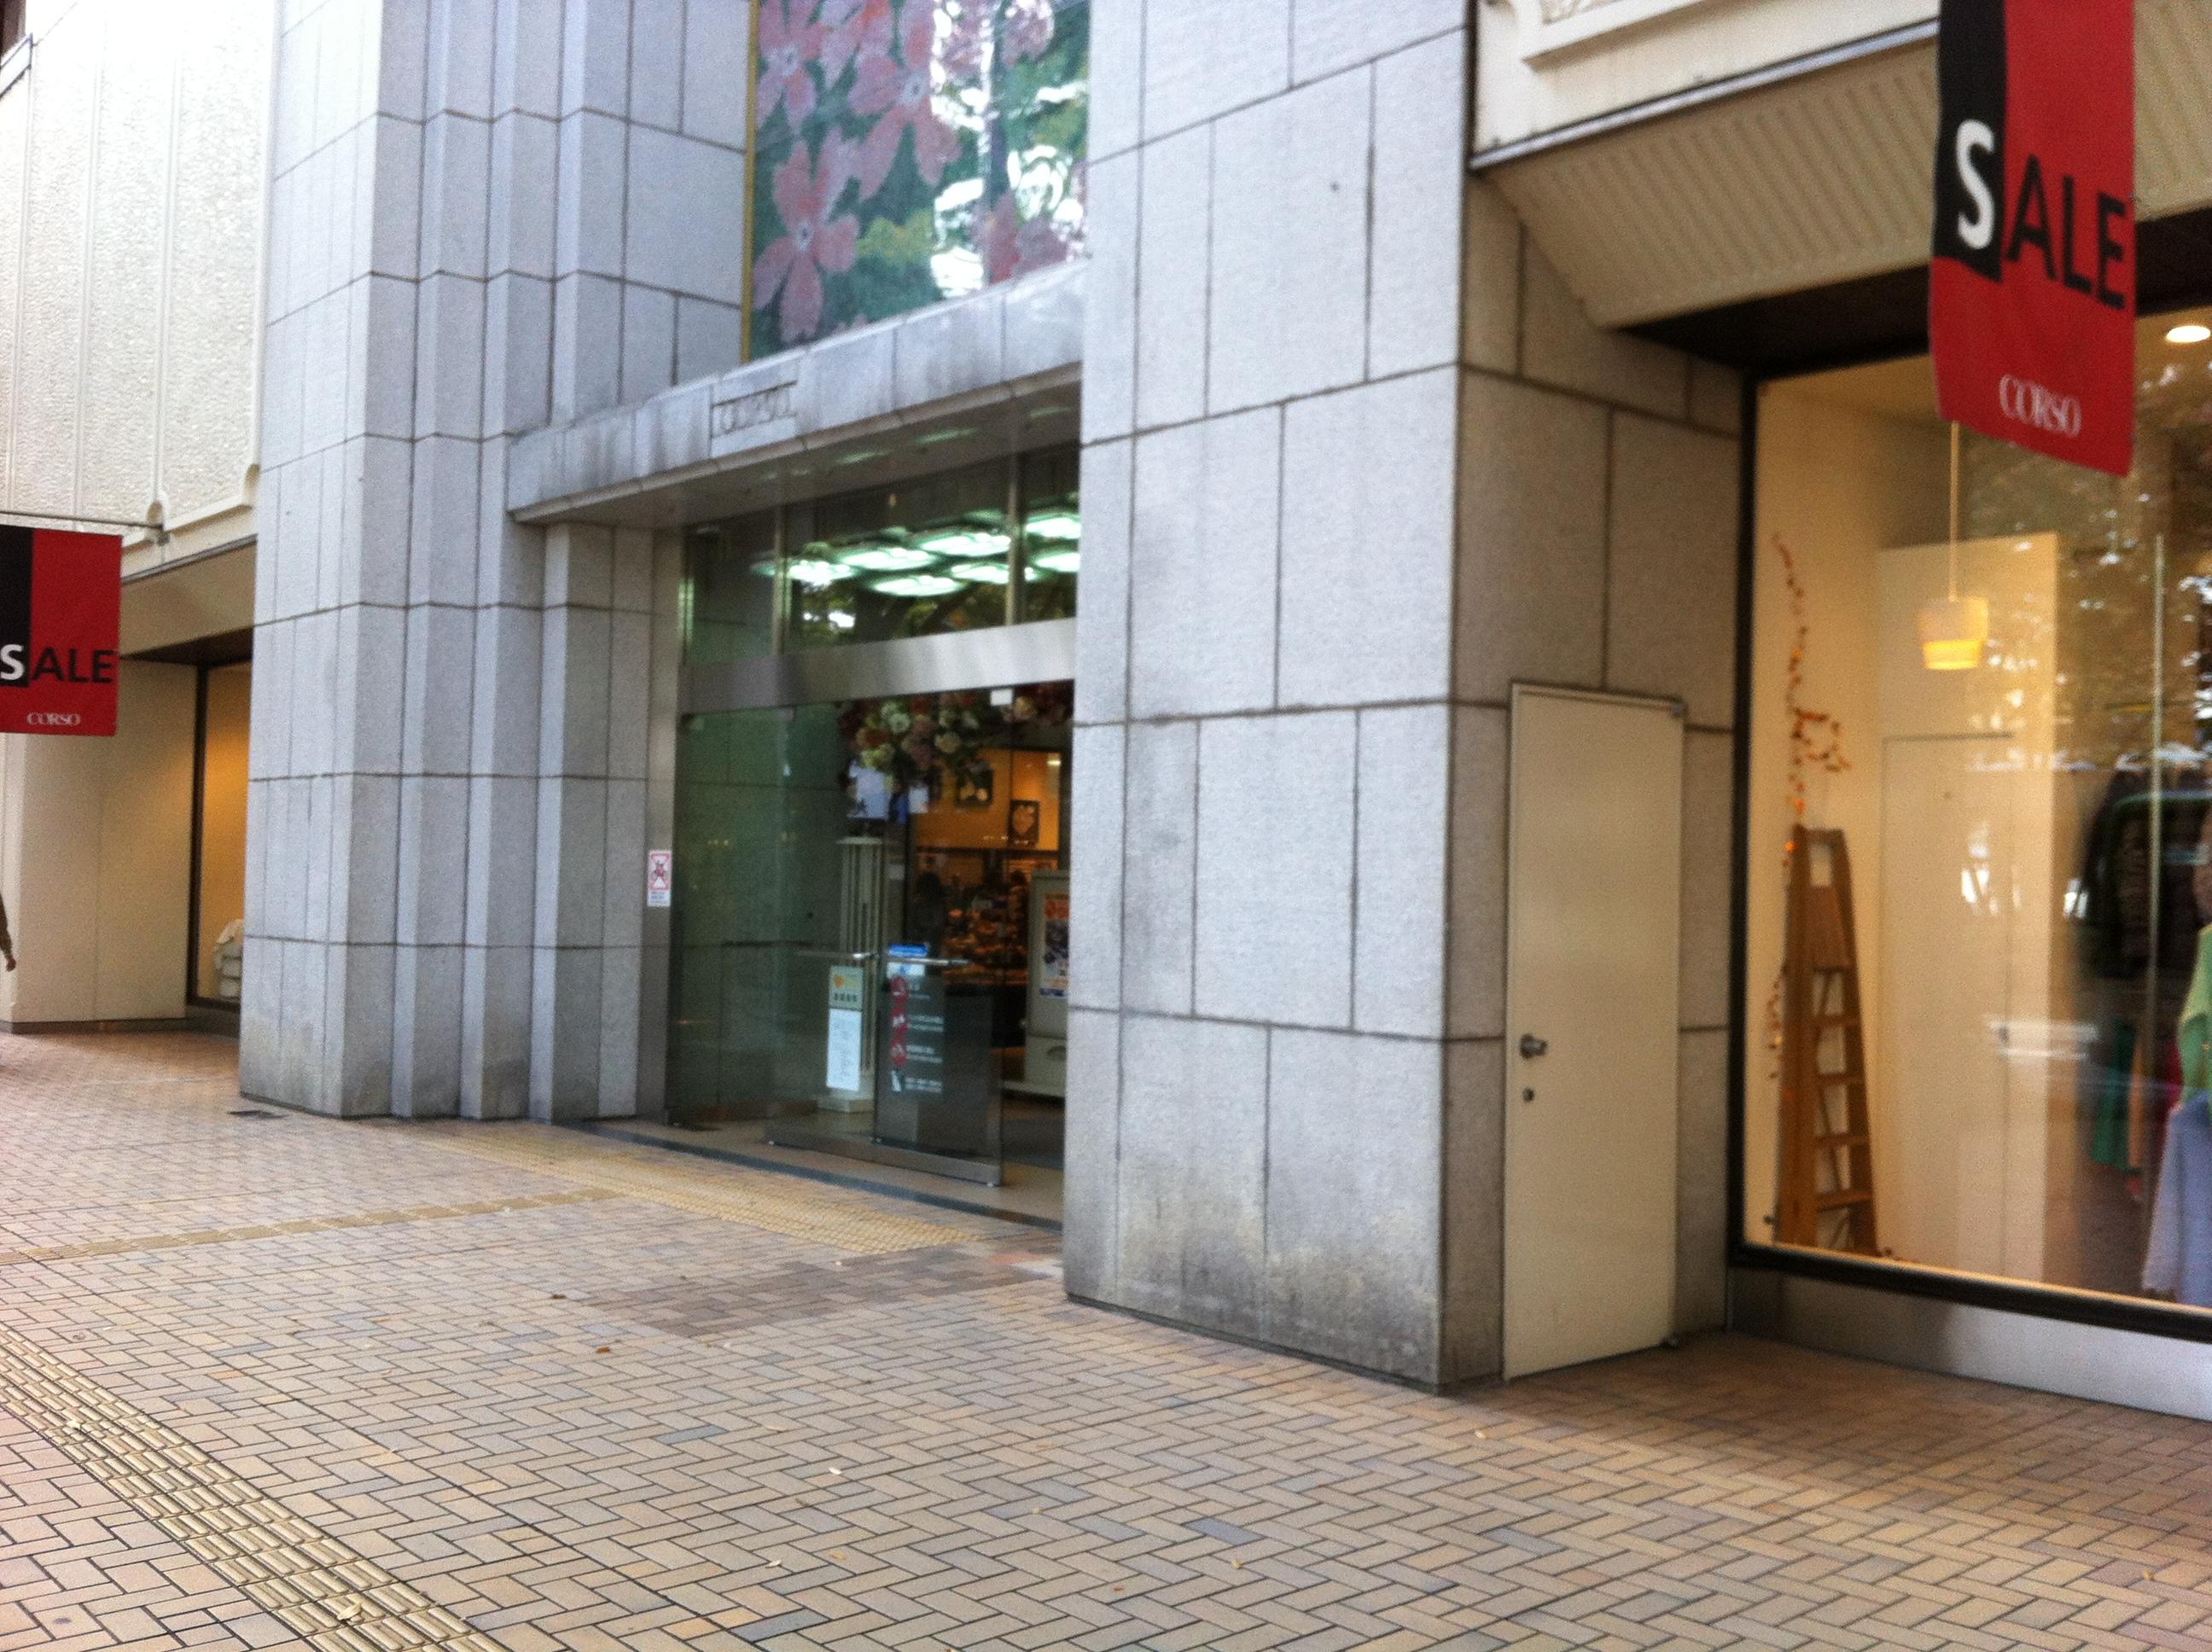 http://www.washin-optical.co.jp/blog/kenchodori/IMG_1153.JPG